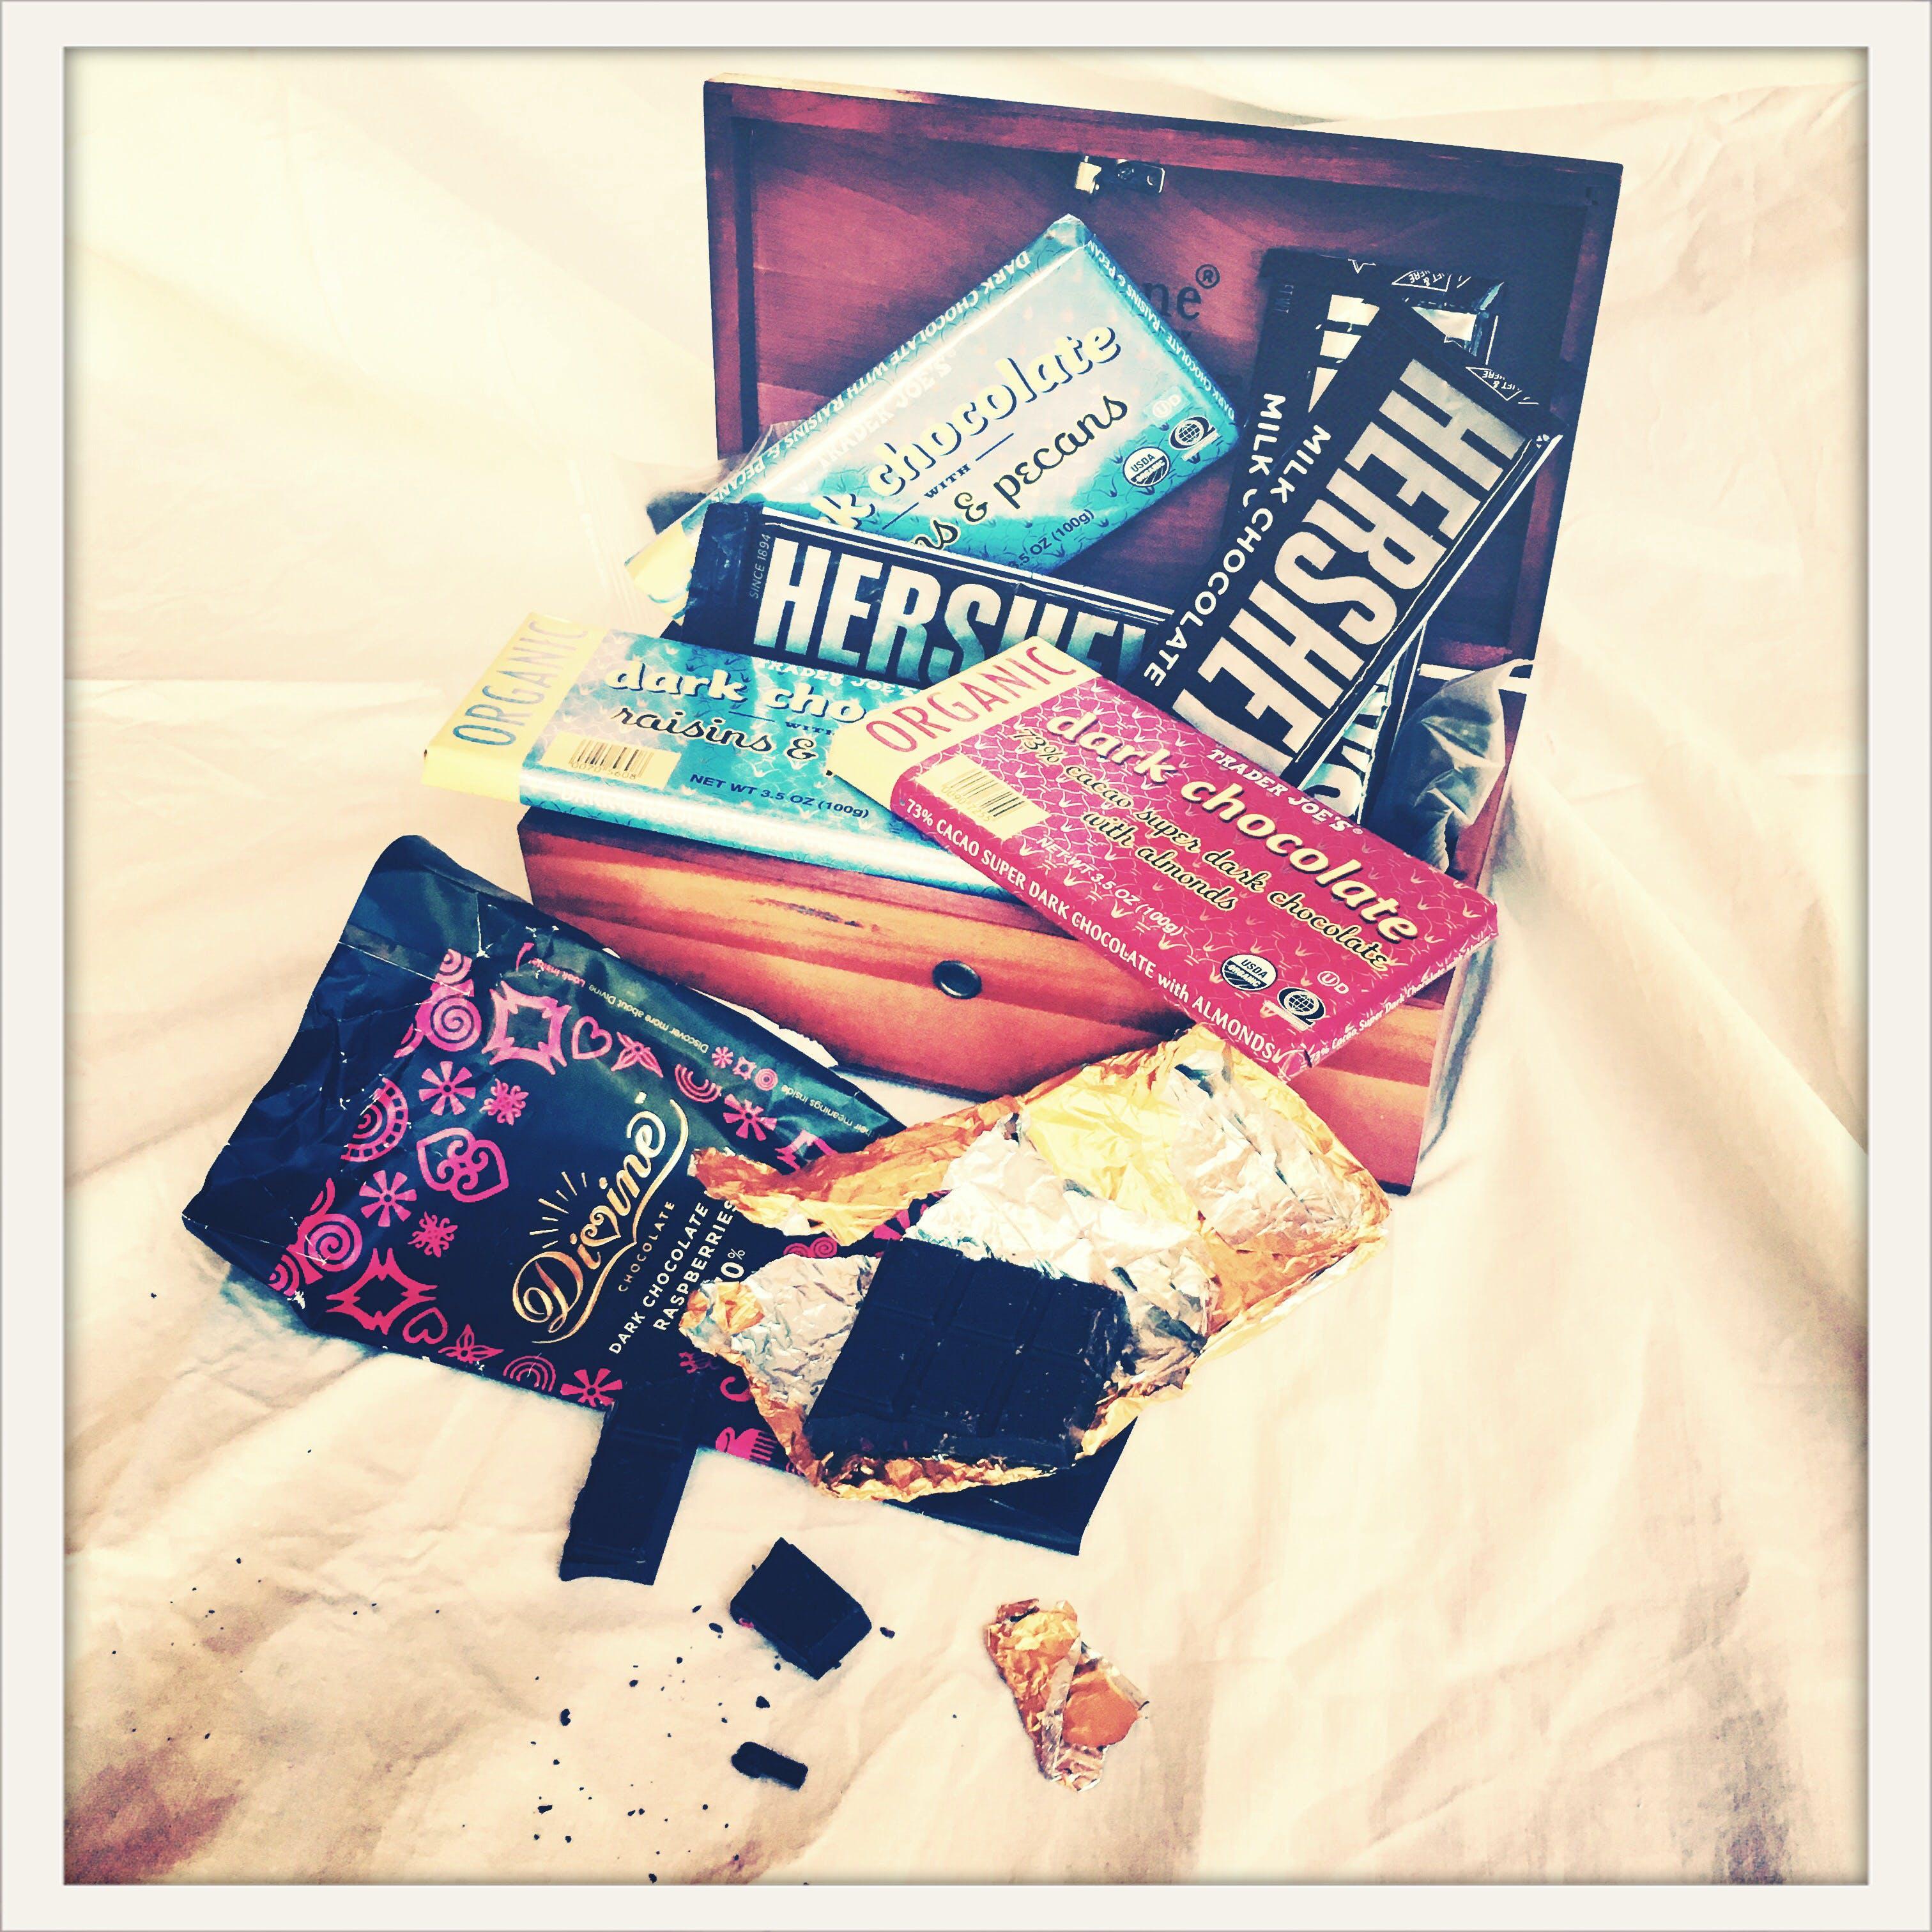 Free stock photo of box of chocolate, candy, chocolate, chocolate bar